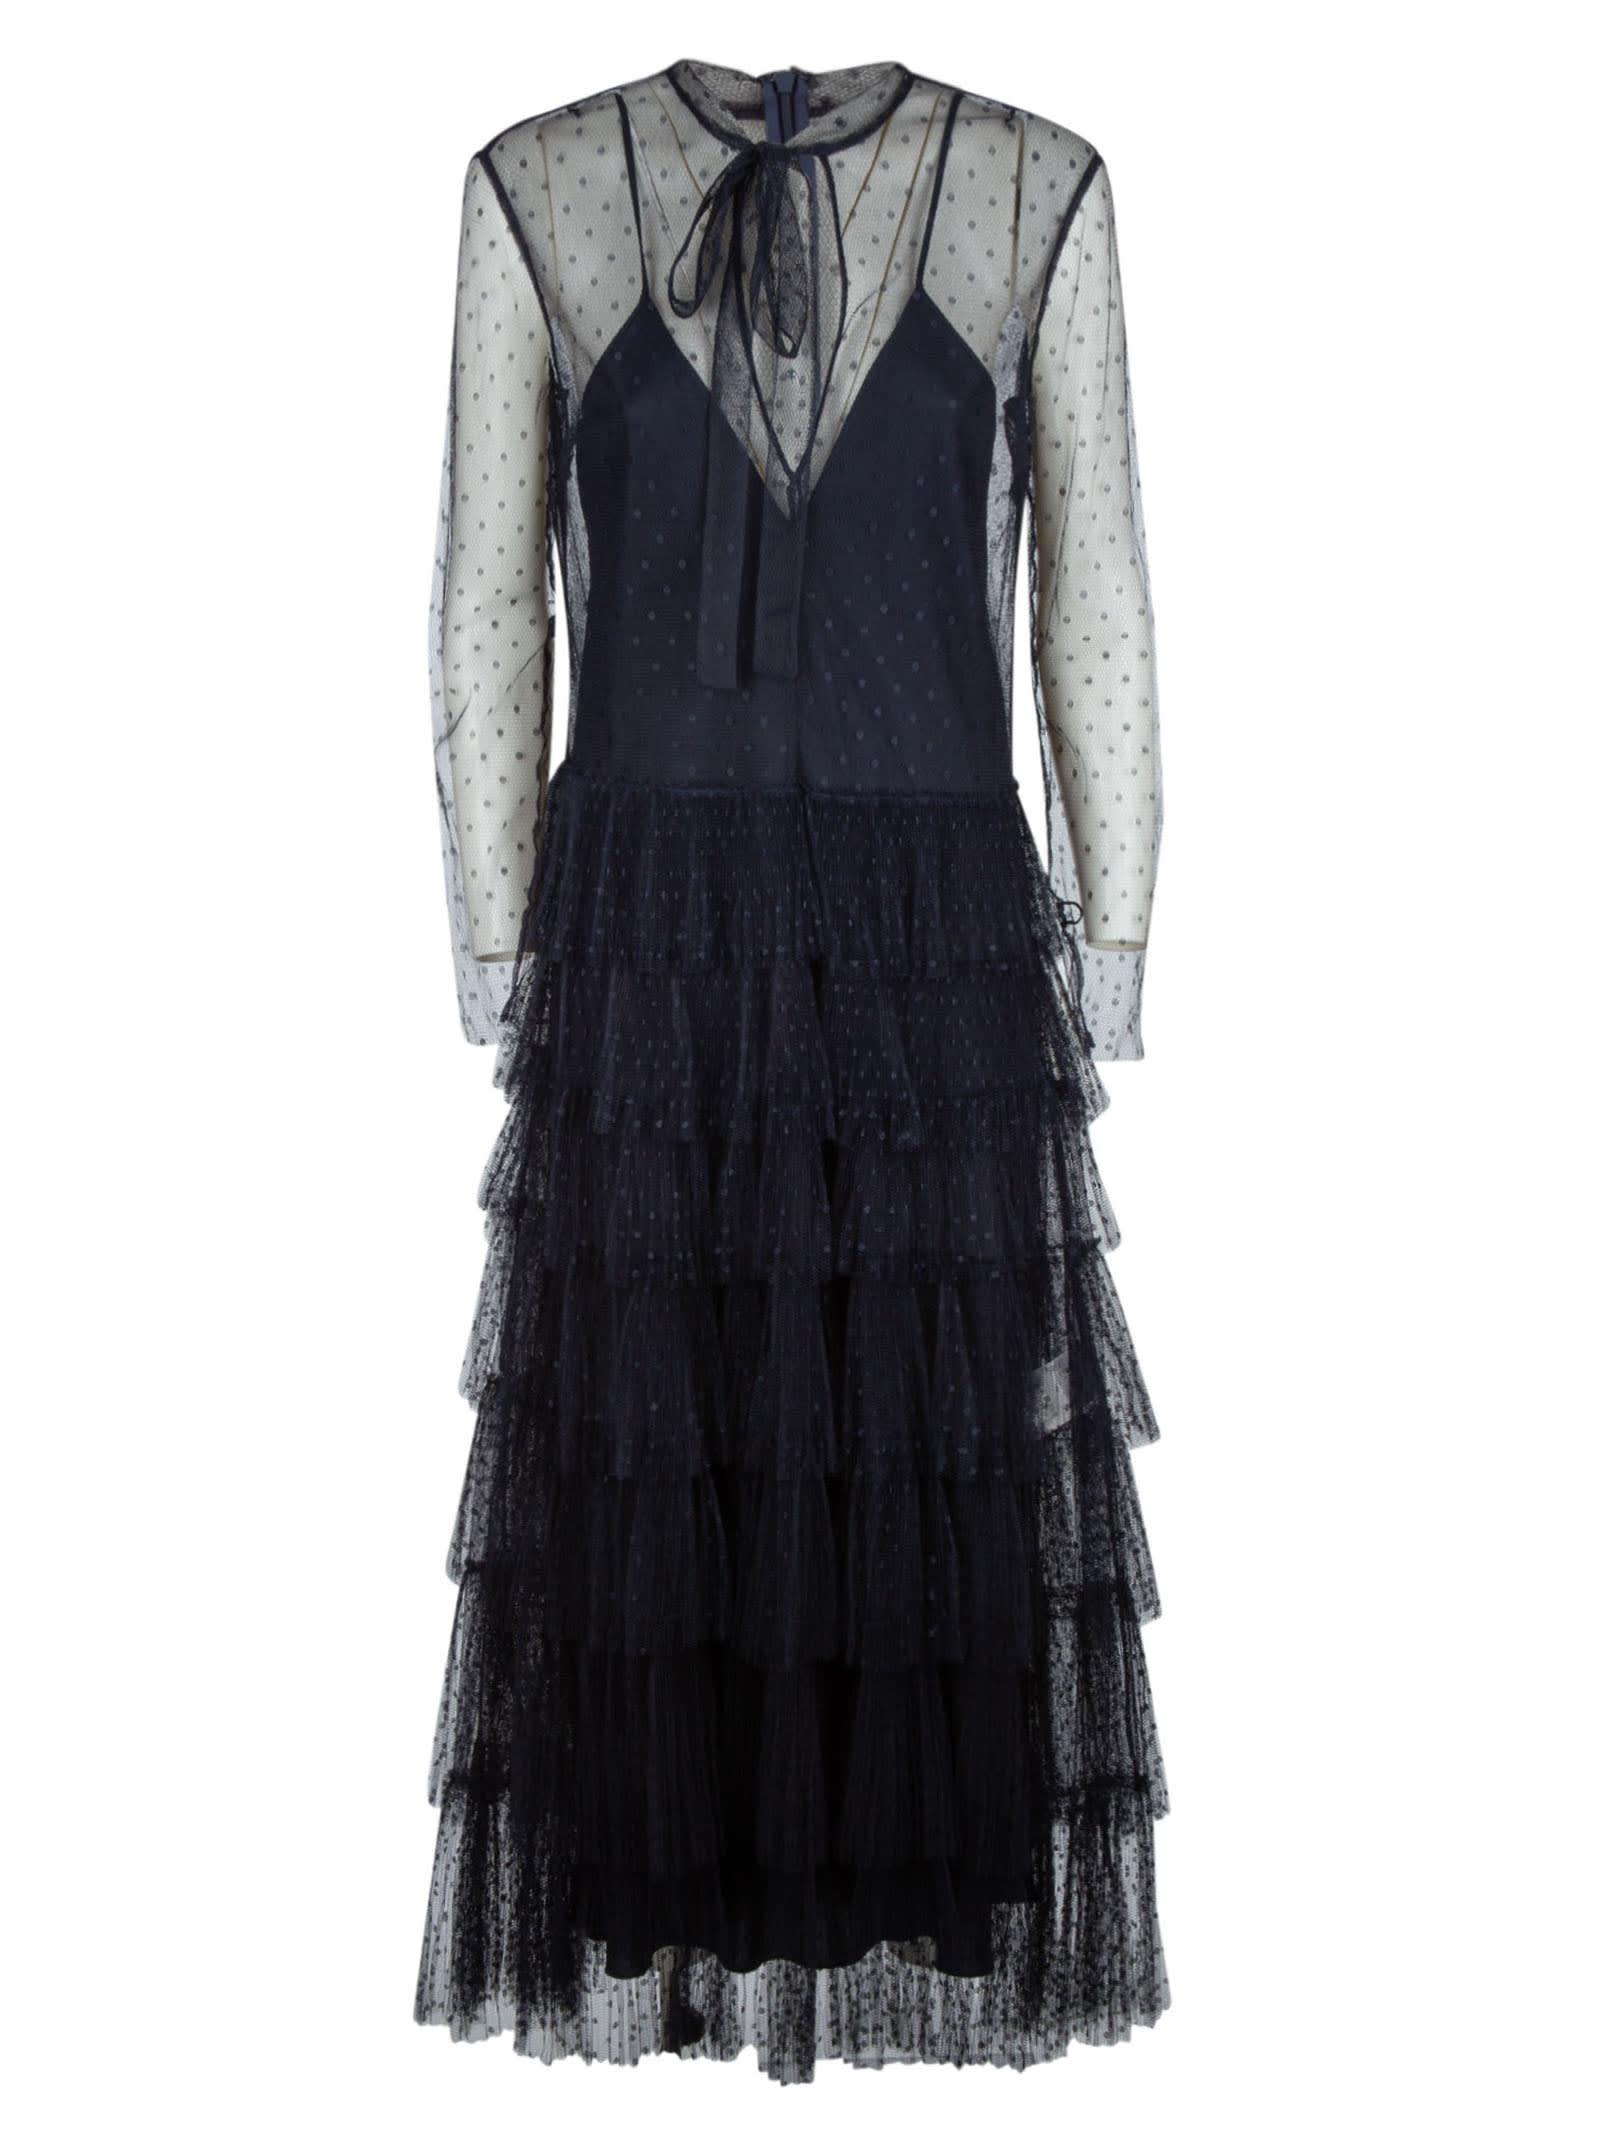 RED Valentino Polka Dot Layered Lace Dress